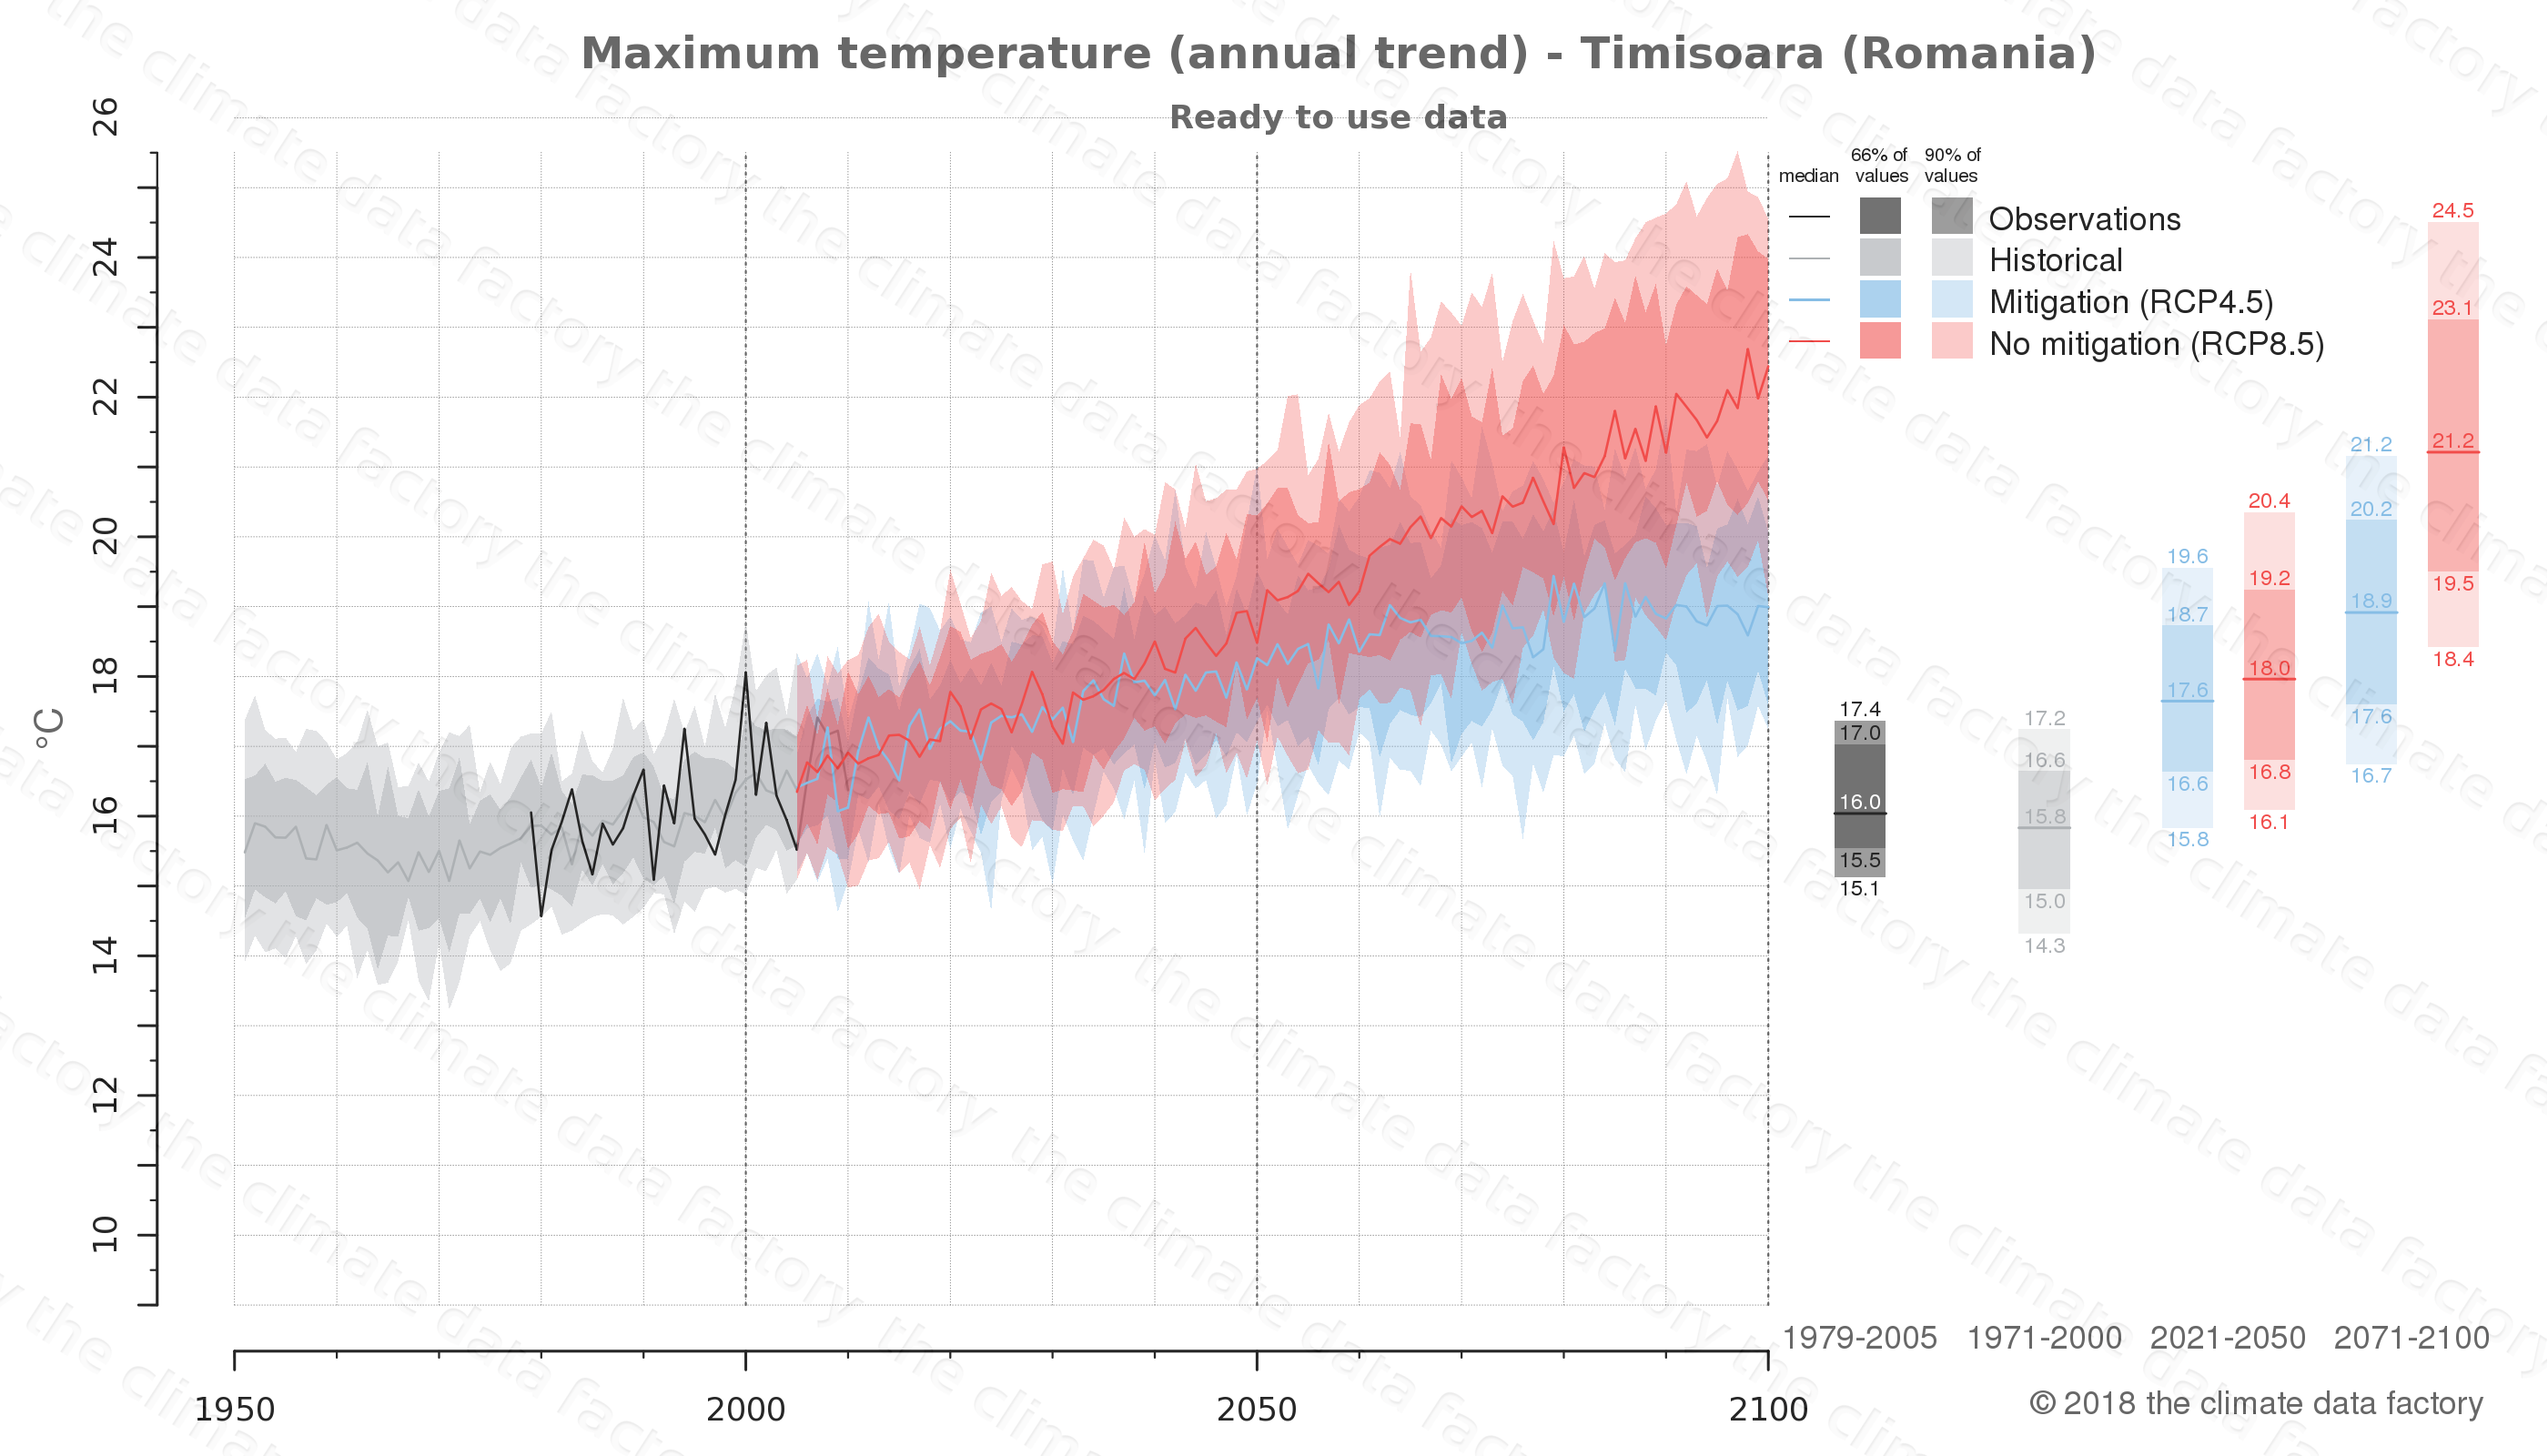 climate change data policy adaptation climate graph city data maximum-temperature timisoara romania